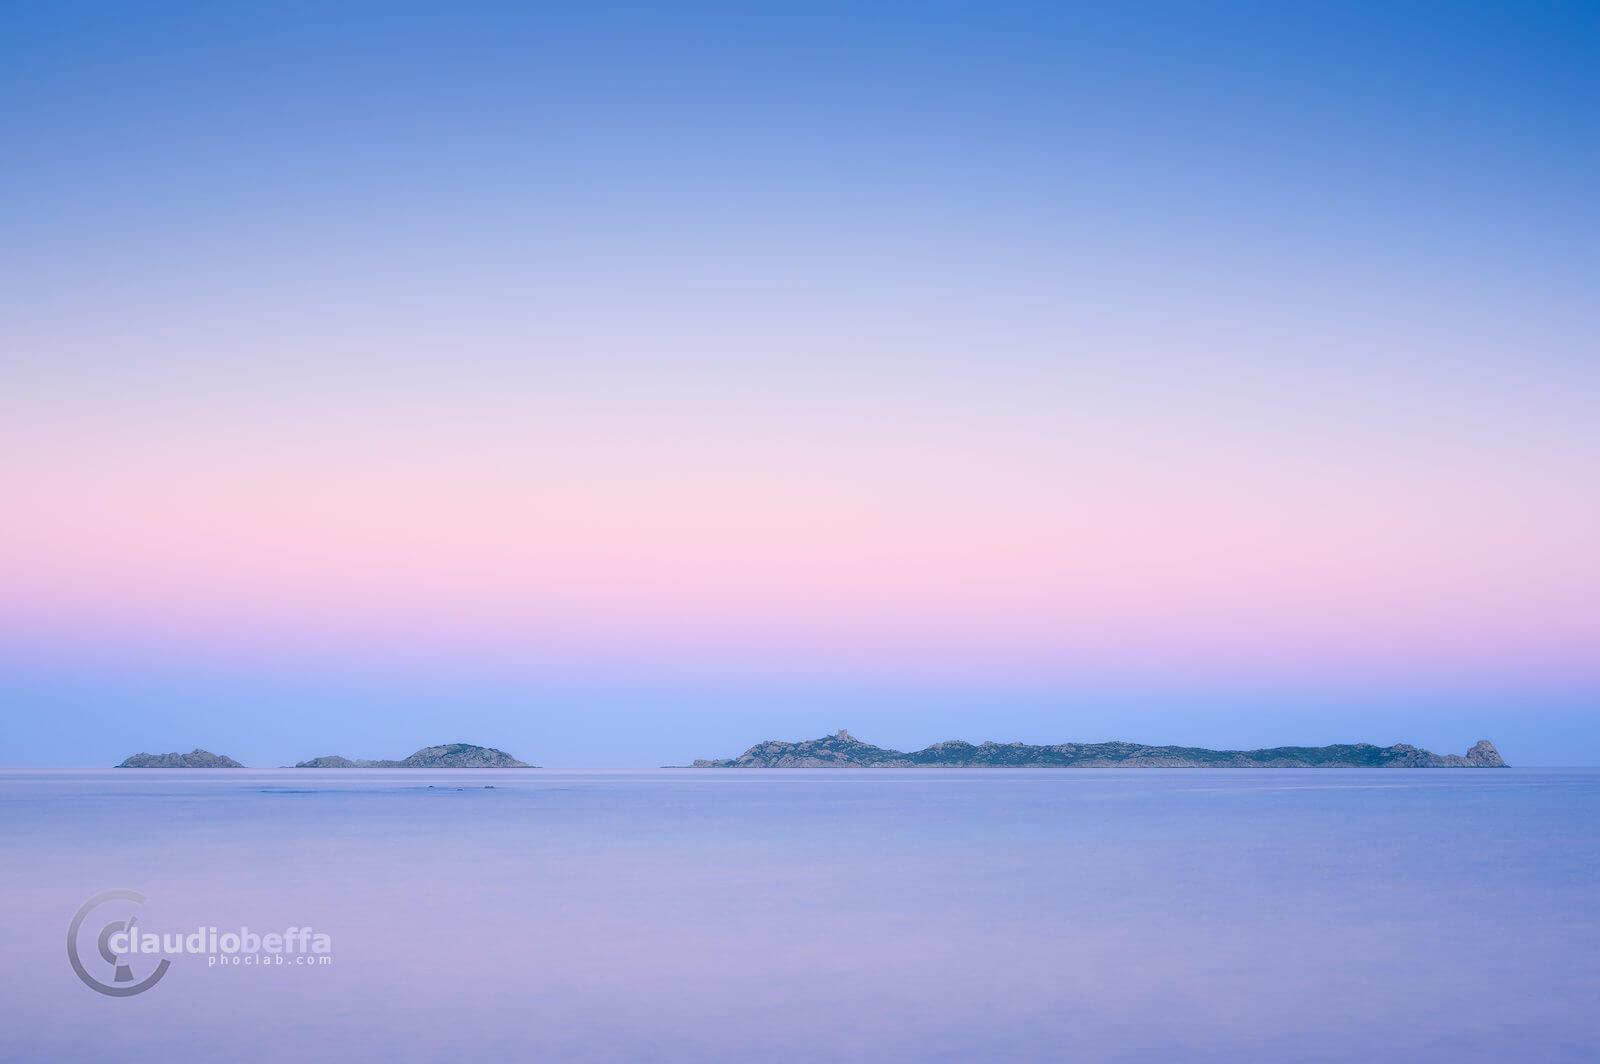 Softness, Italy, Sardinia, Island, Sea, Twilight, Seascape, Sunset, Nature, Pink, Blue, Soft, Long exposure